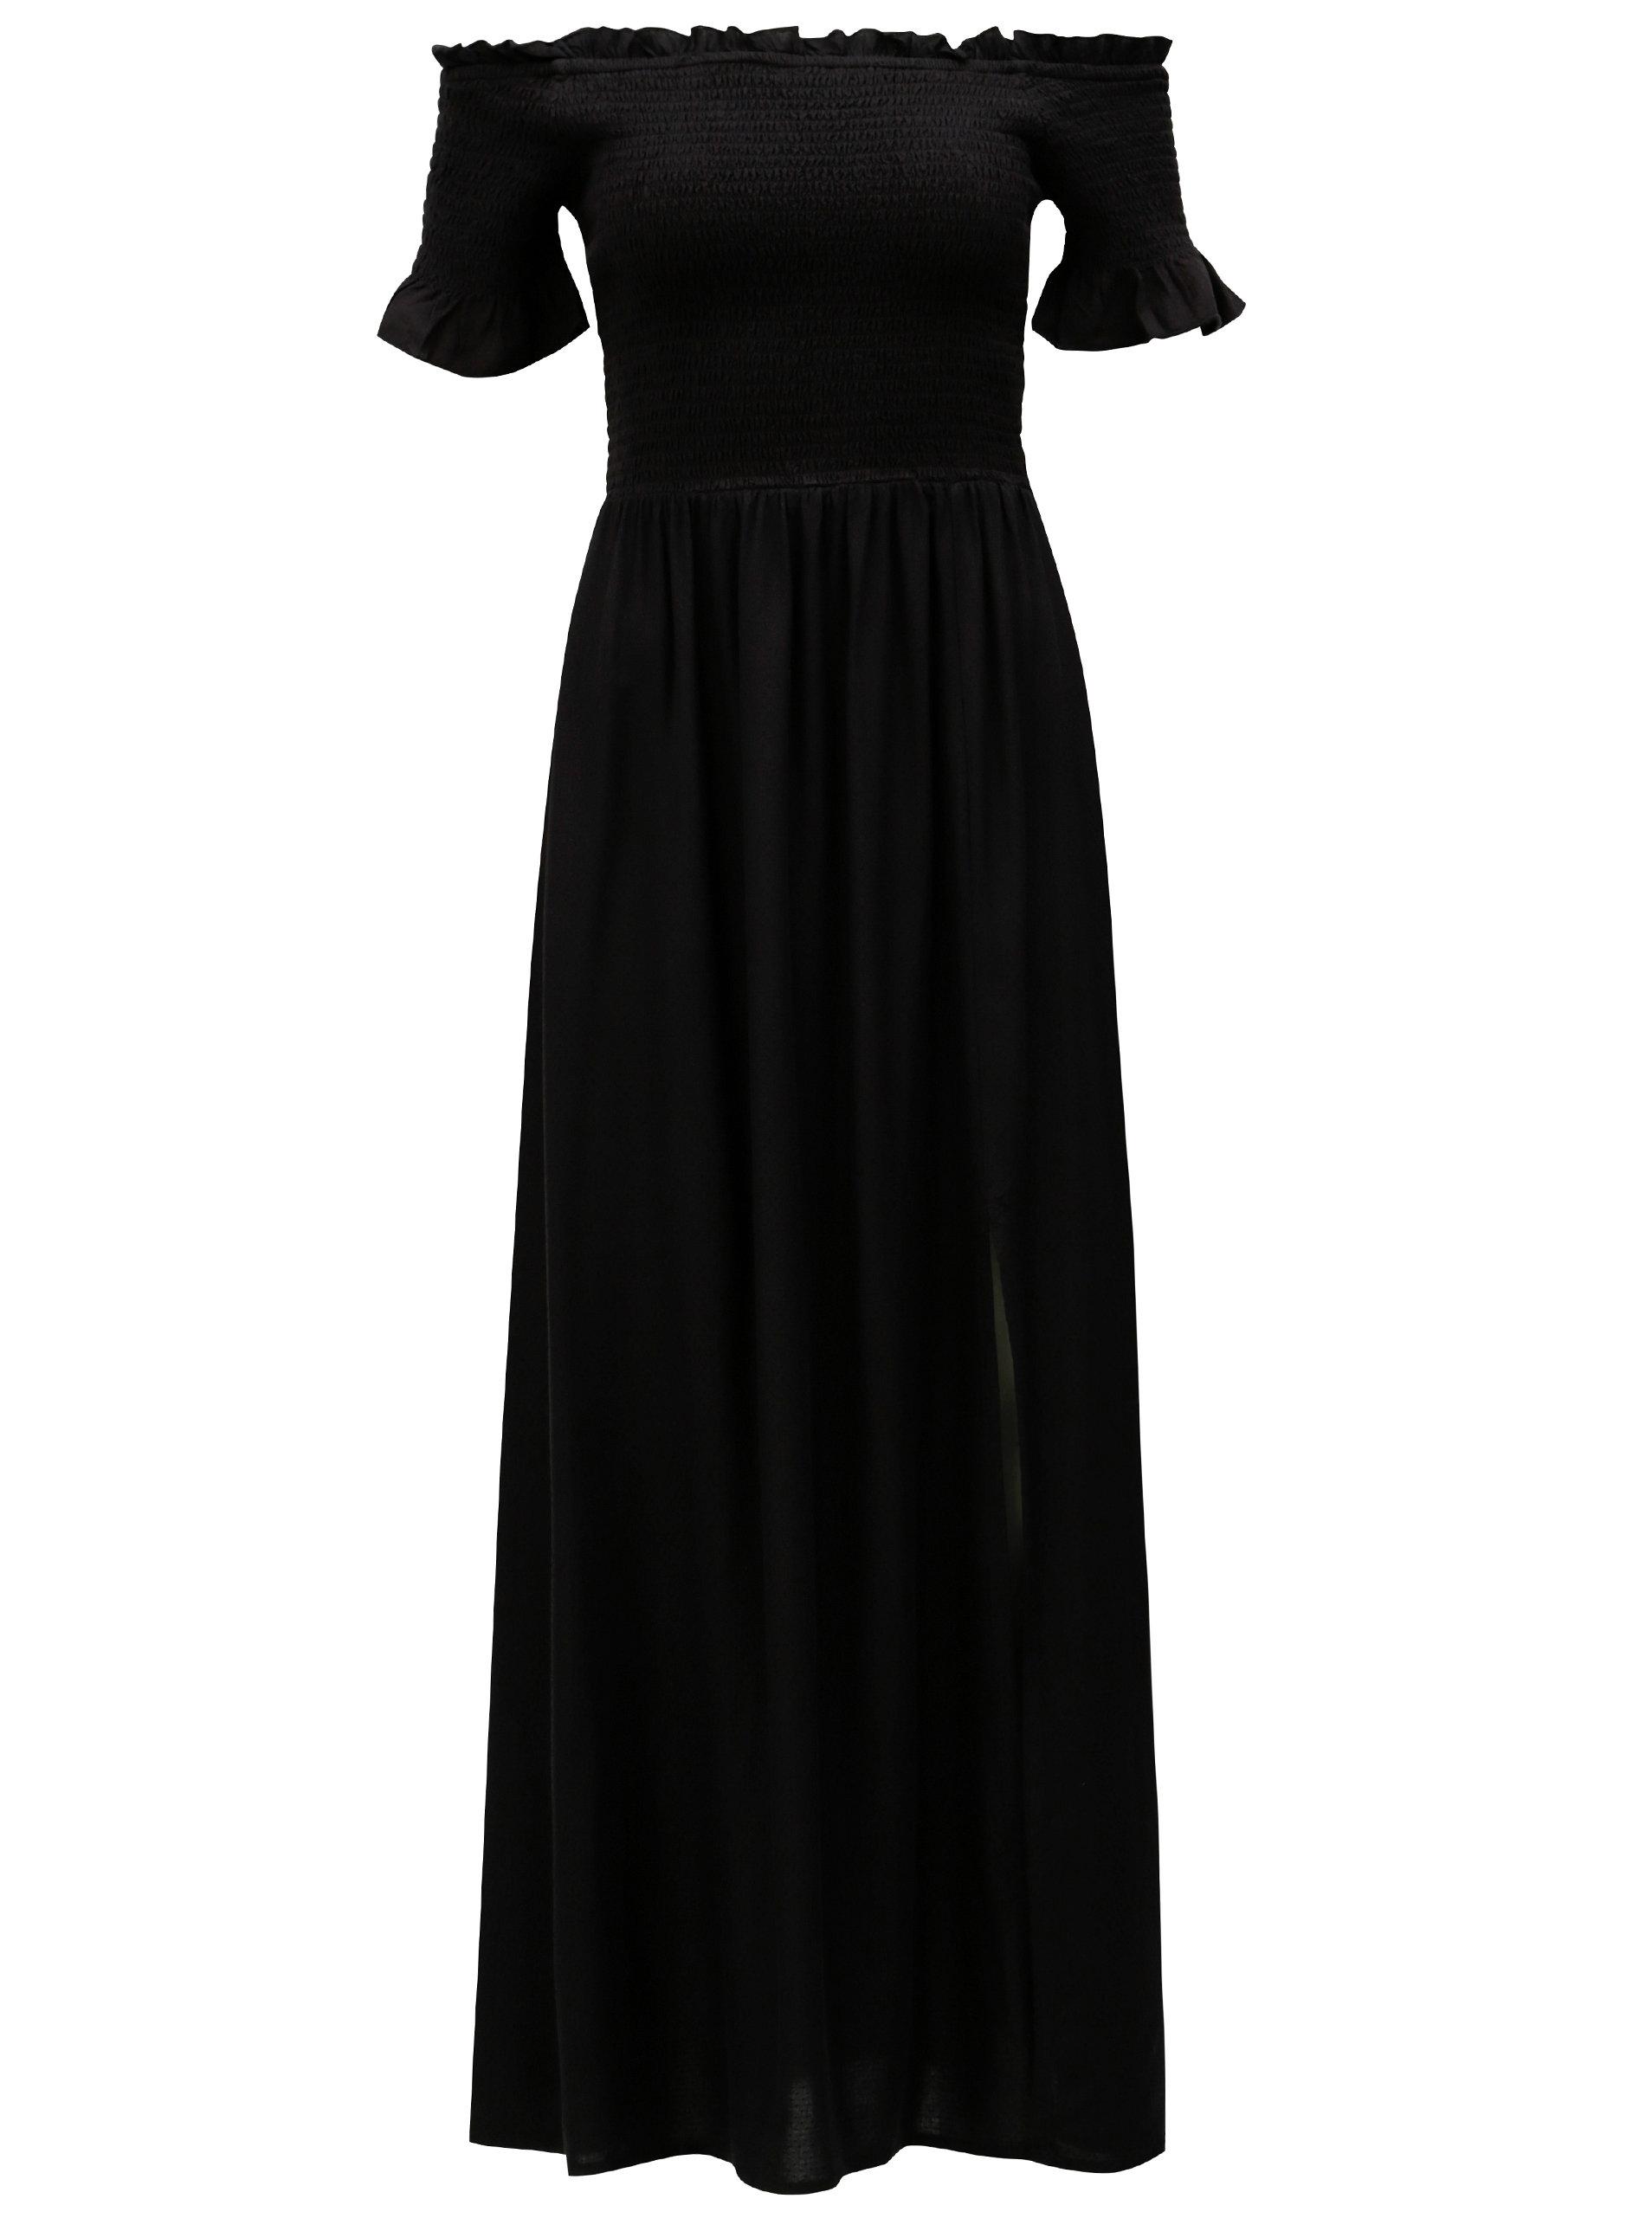 Čierne maxišaty s odhalenými ramenami VERO MODA Alexa ... 2b95d38193d